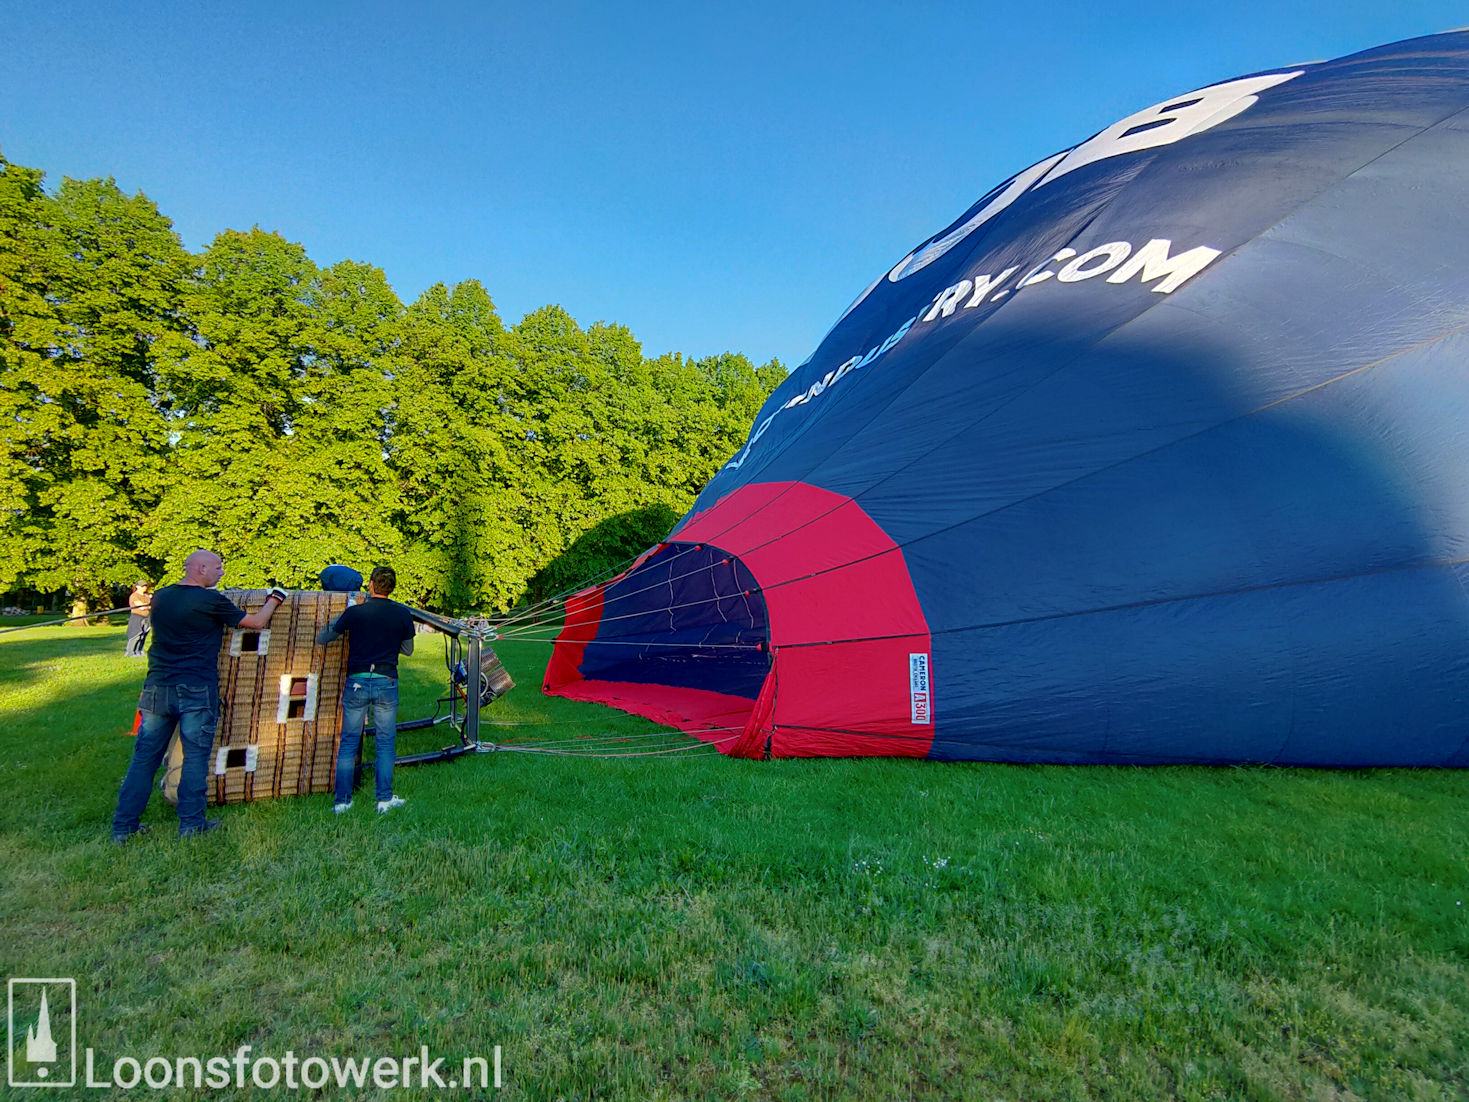 Ballonvaart vanaf de Kasteelweide 3